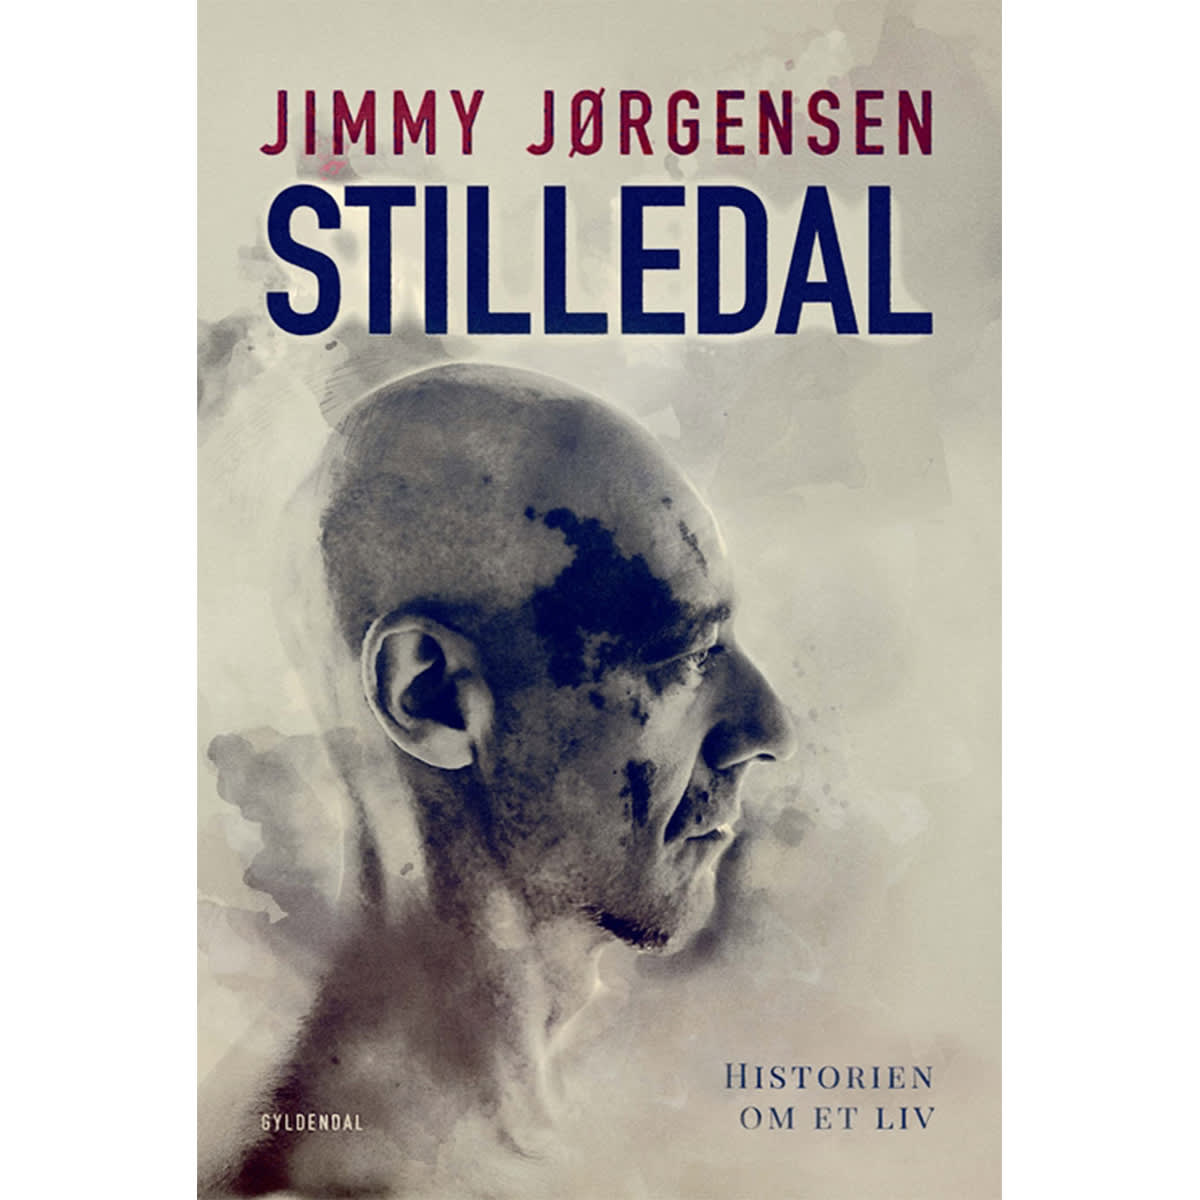 Af Andreas Fugl Thøgersen & Jimmy Jørgensen